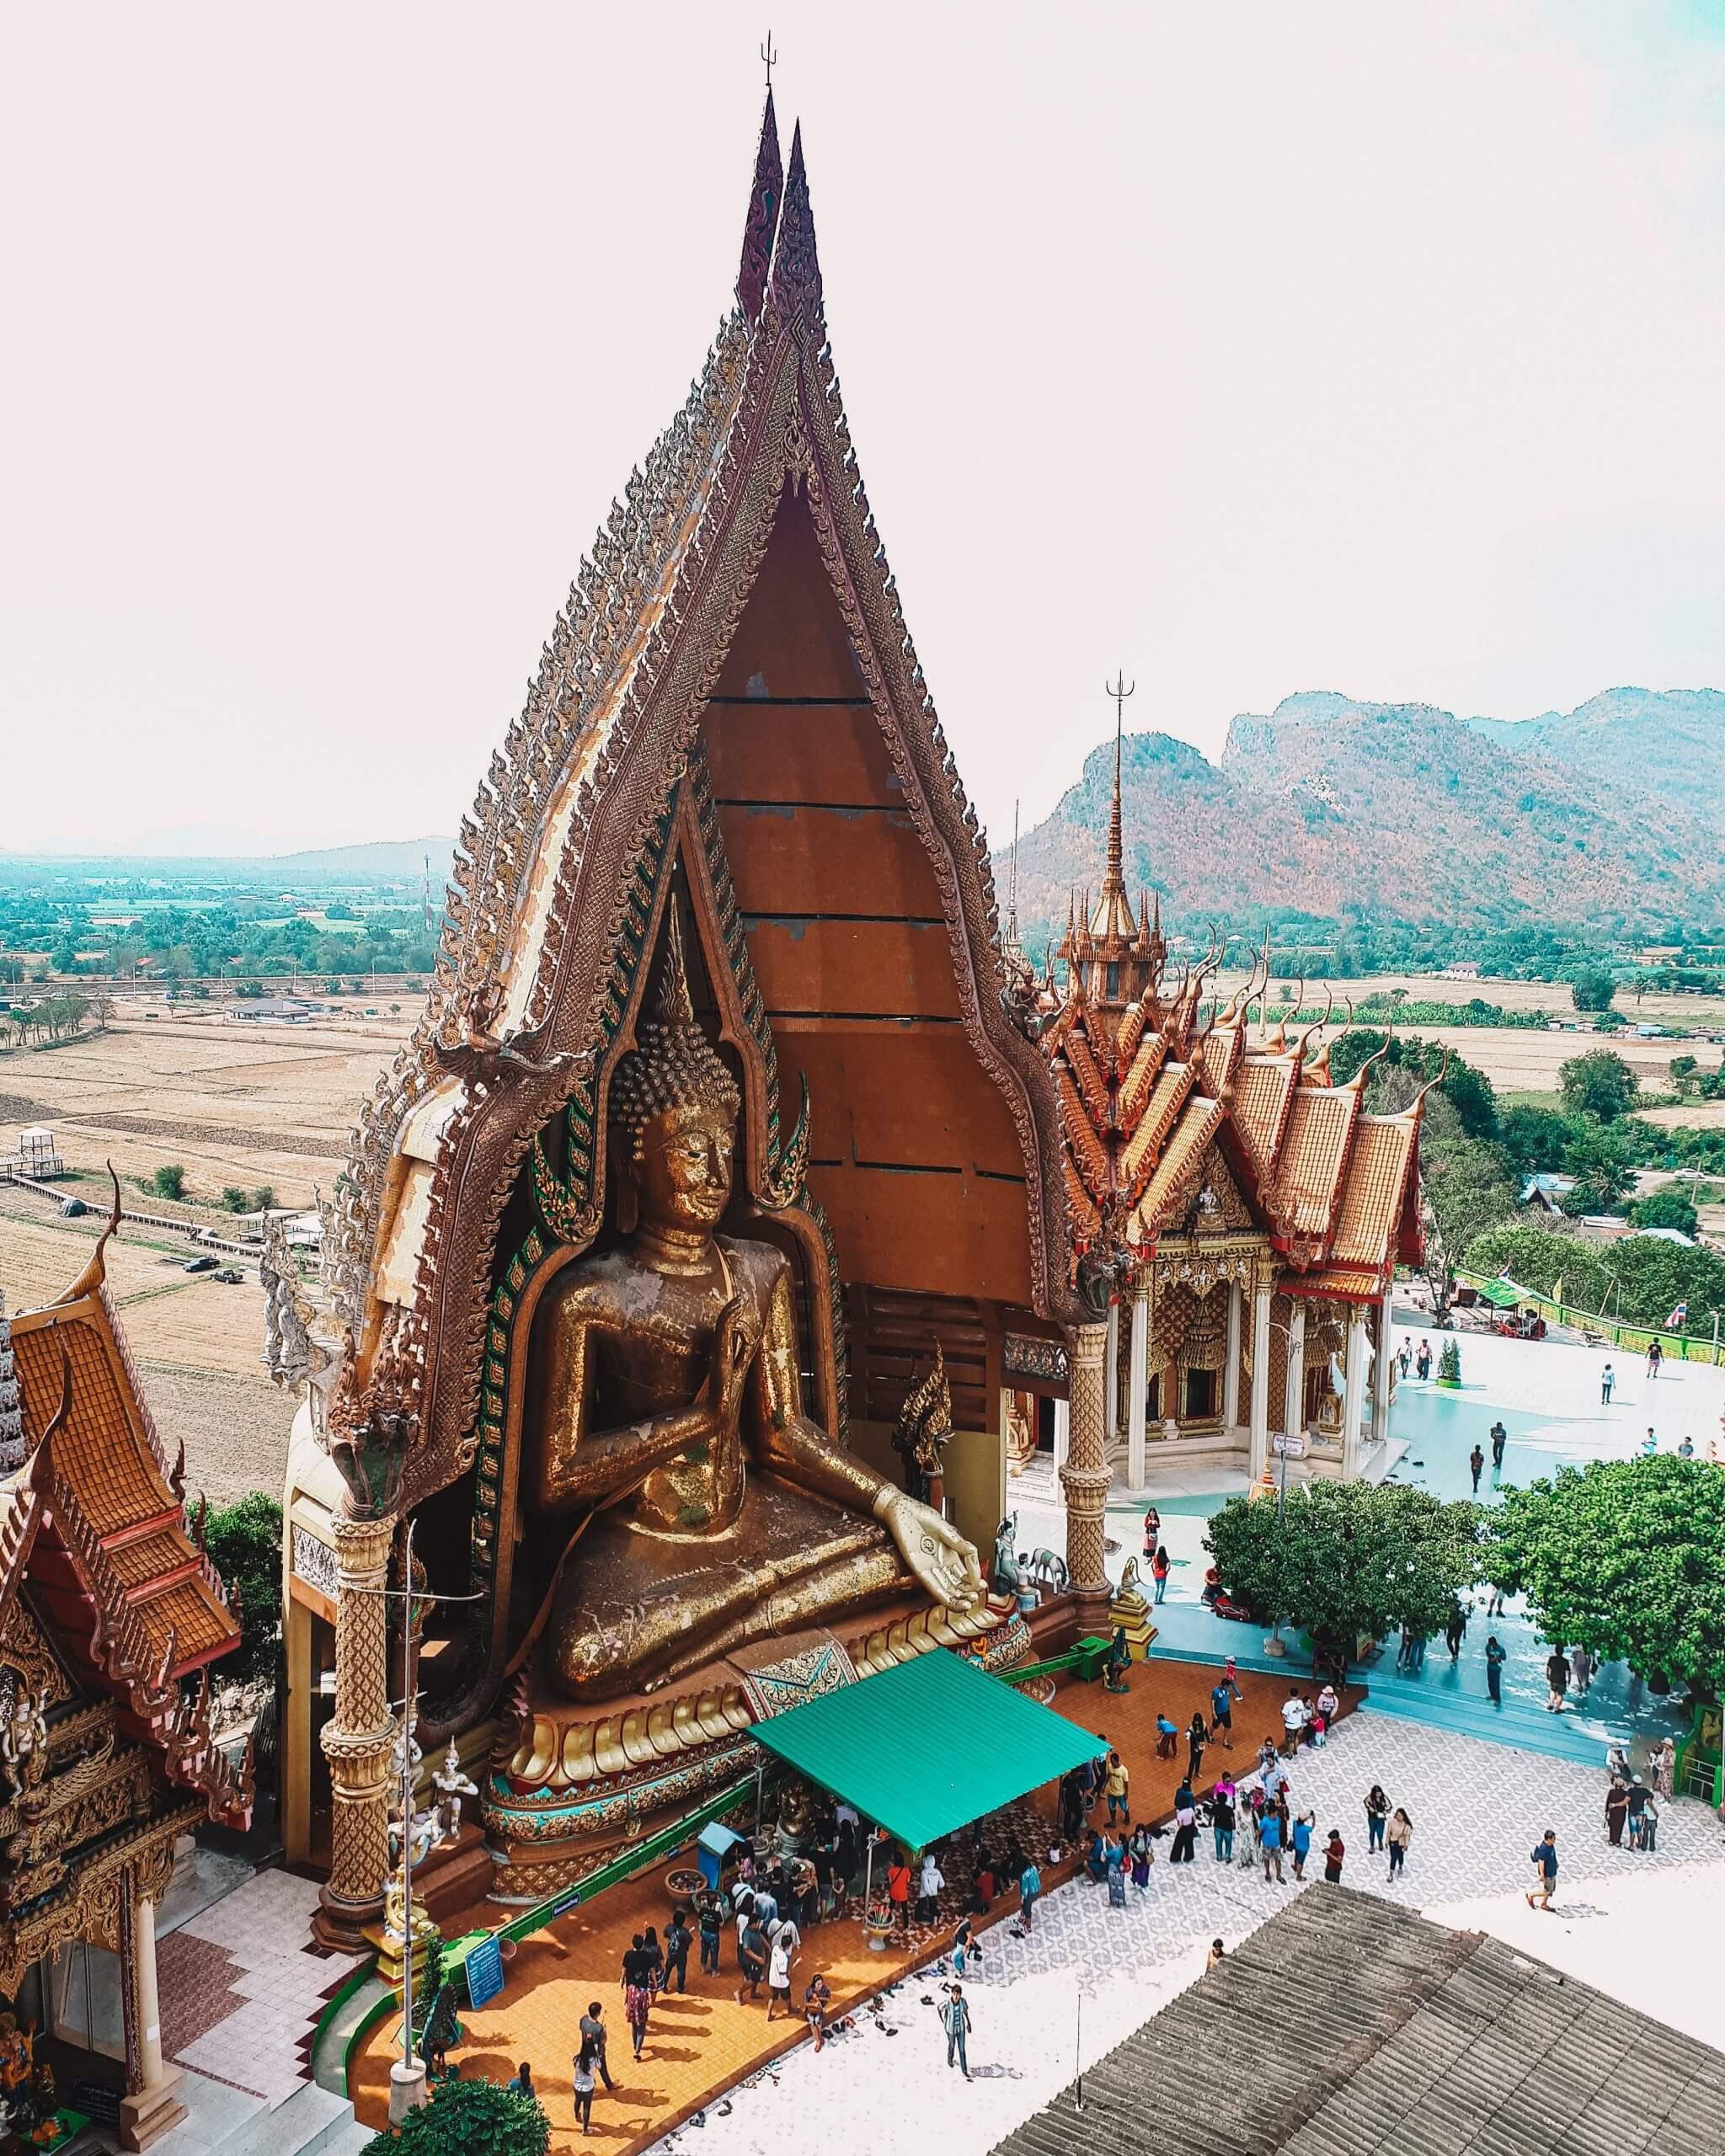 The beautiful tiger temple in Kanchanaburi Thailand